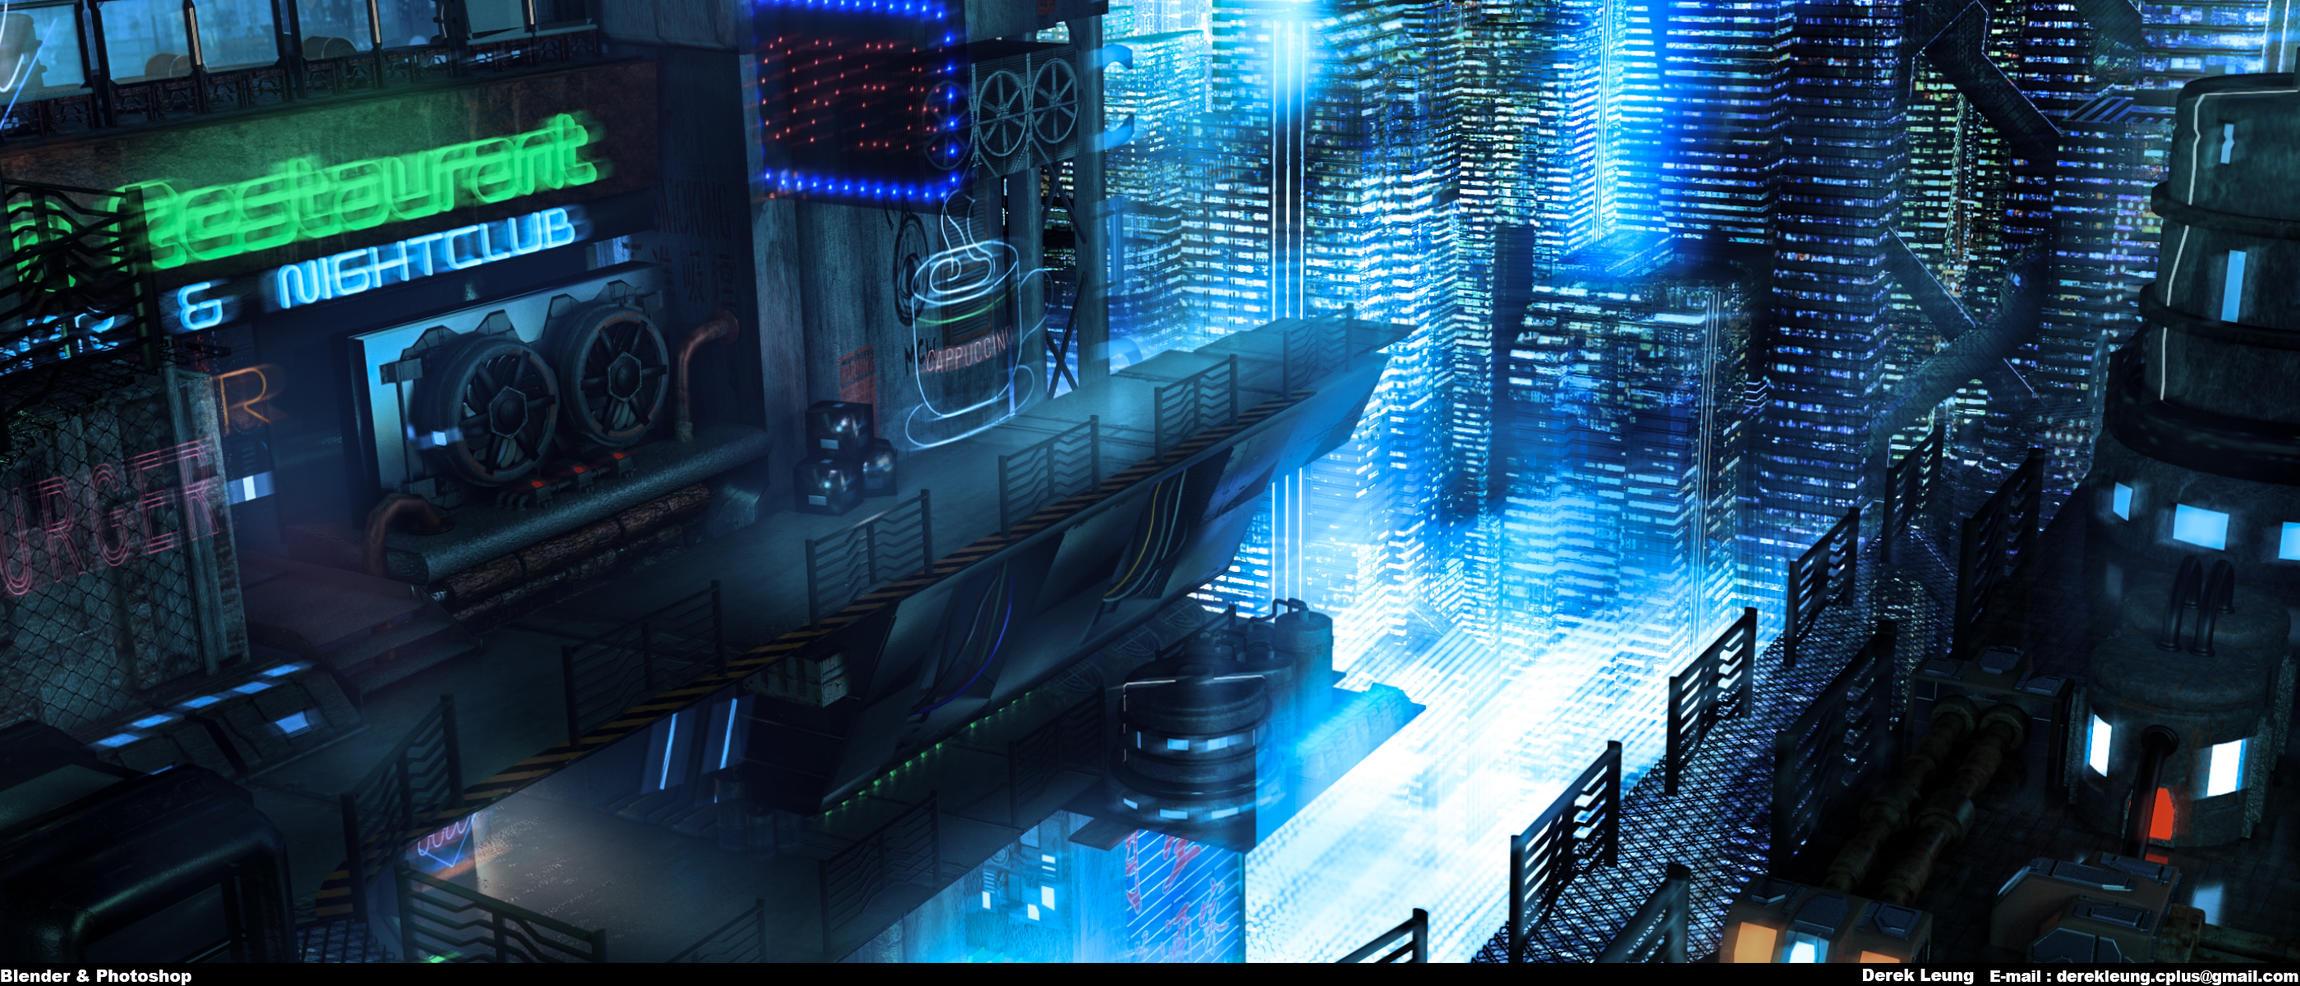 cyberpunk night club